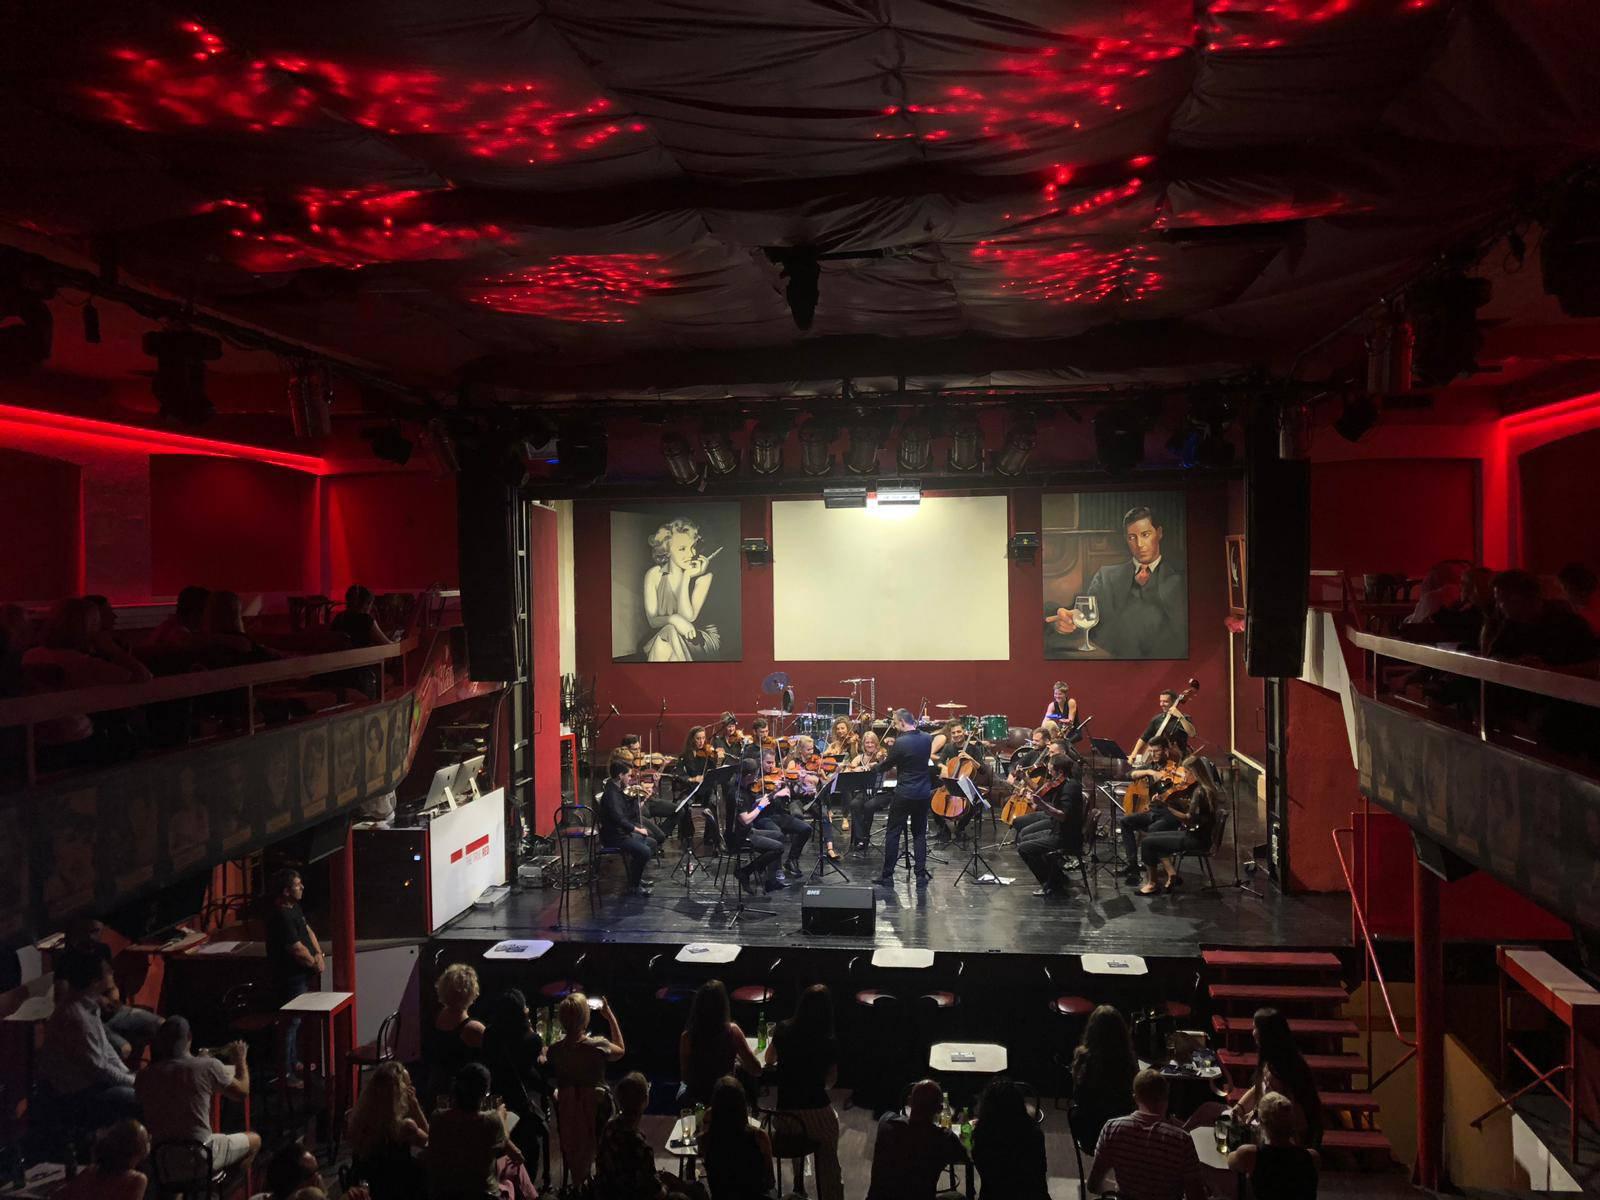 Ansambl No Borders Orchestra nastupa ovaj mjesec u 'Laubi'